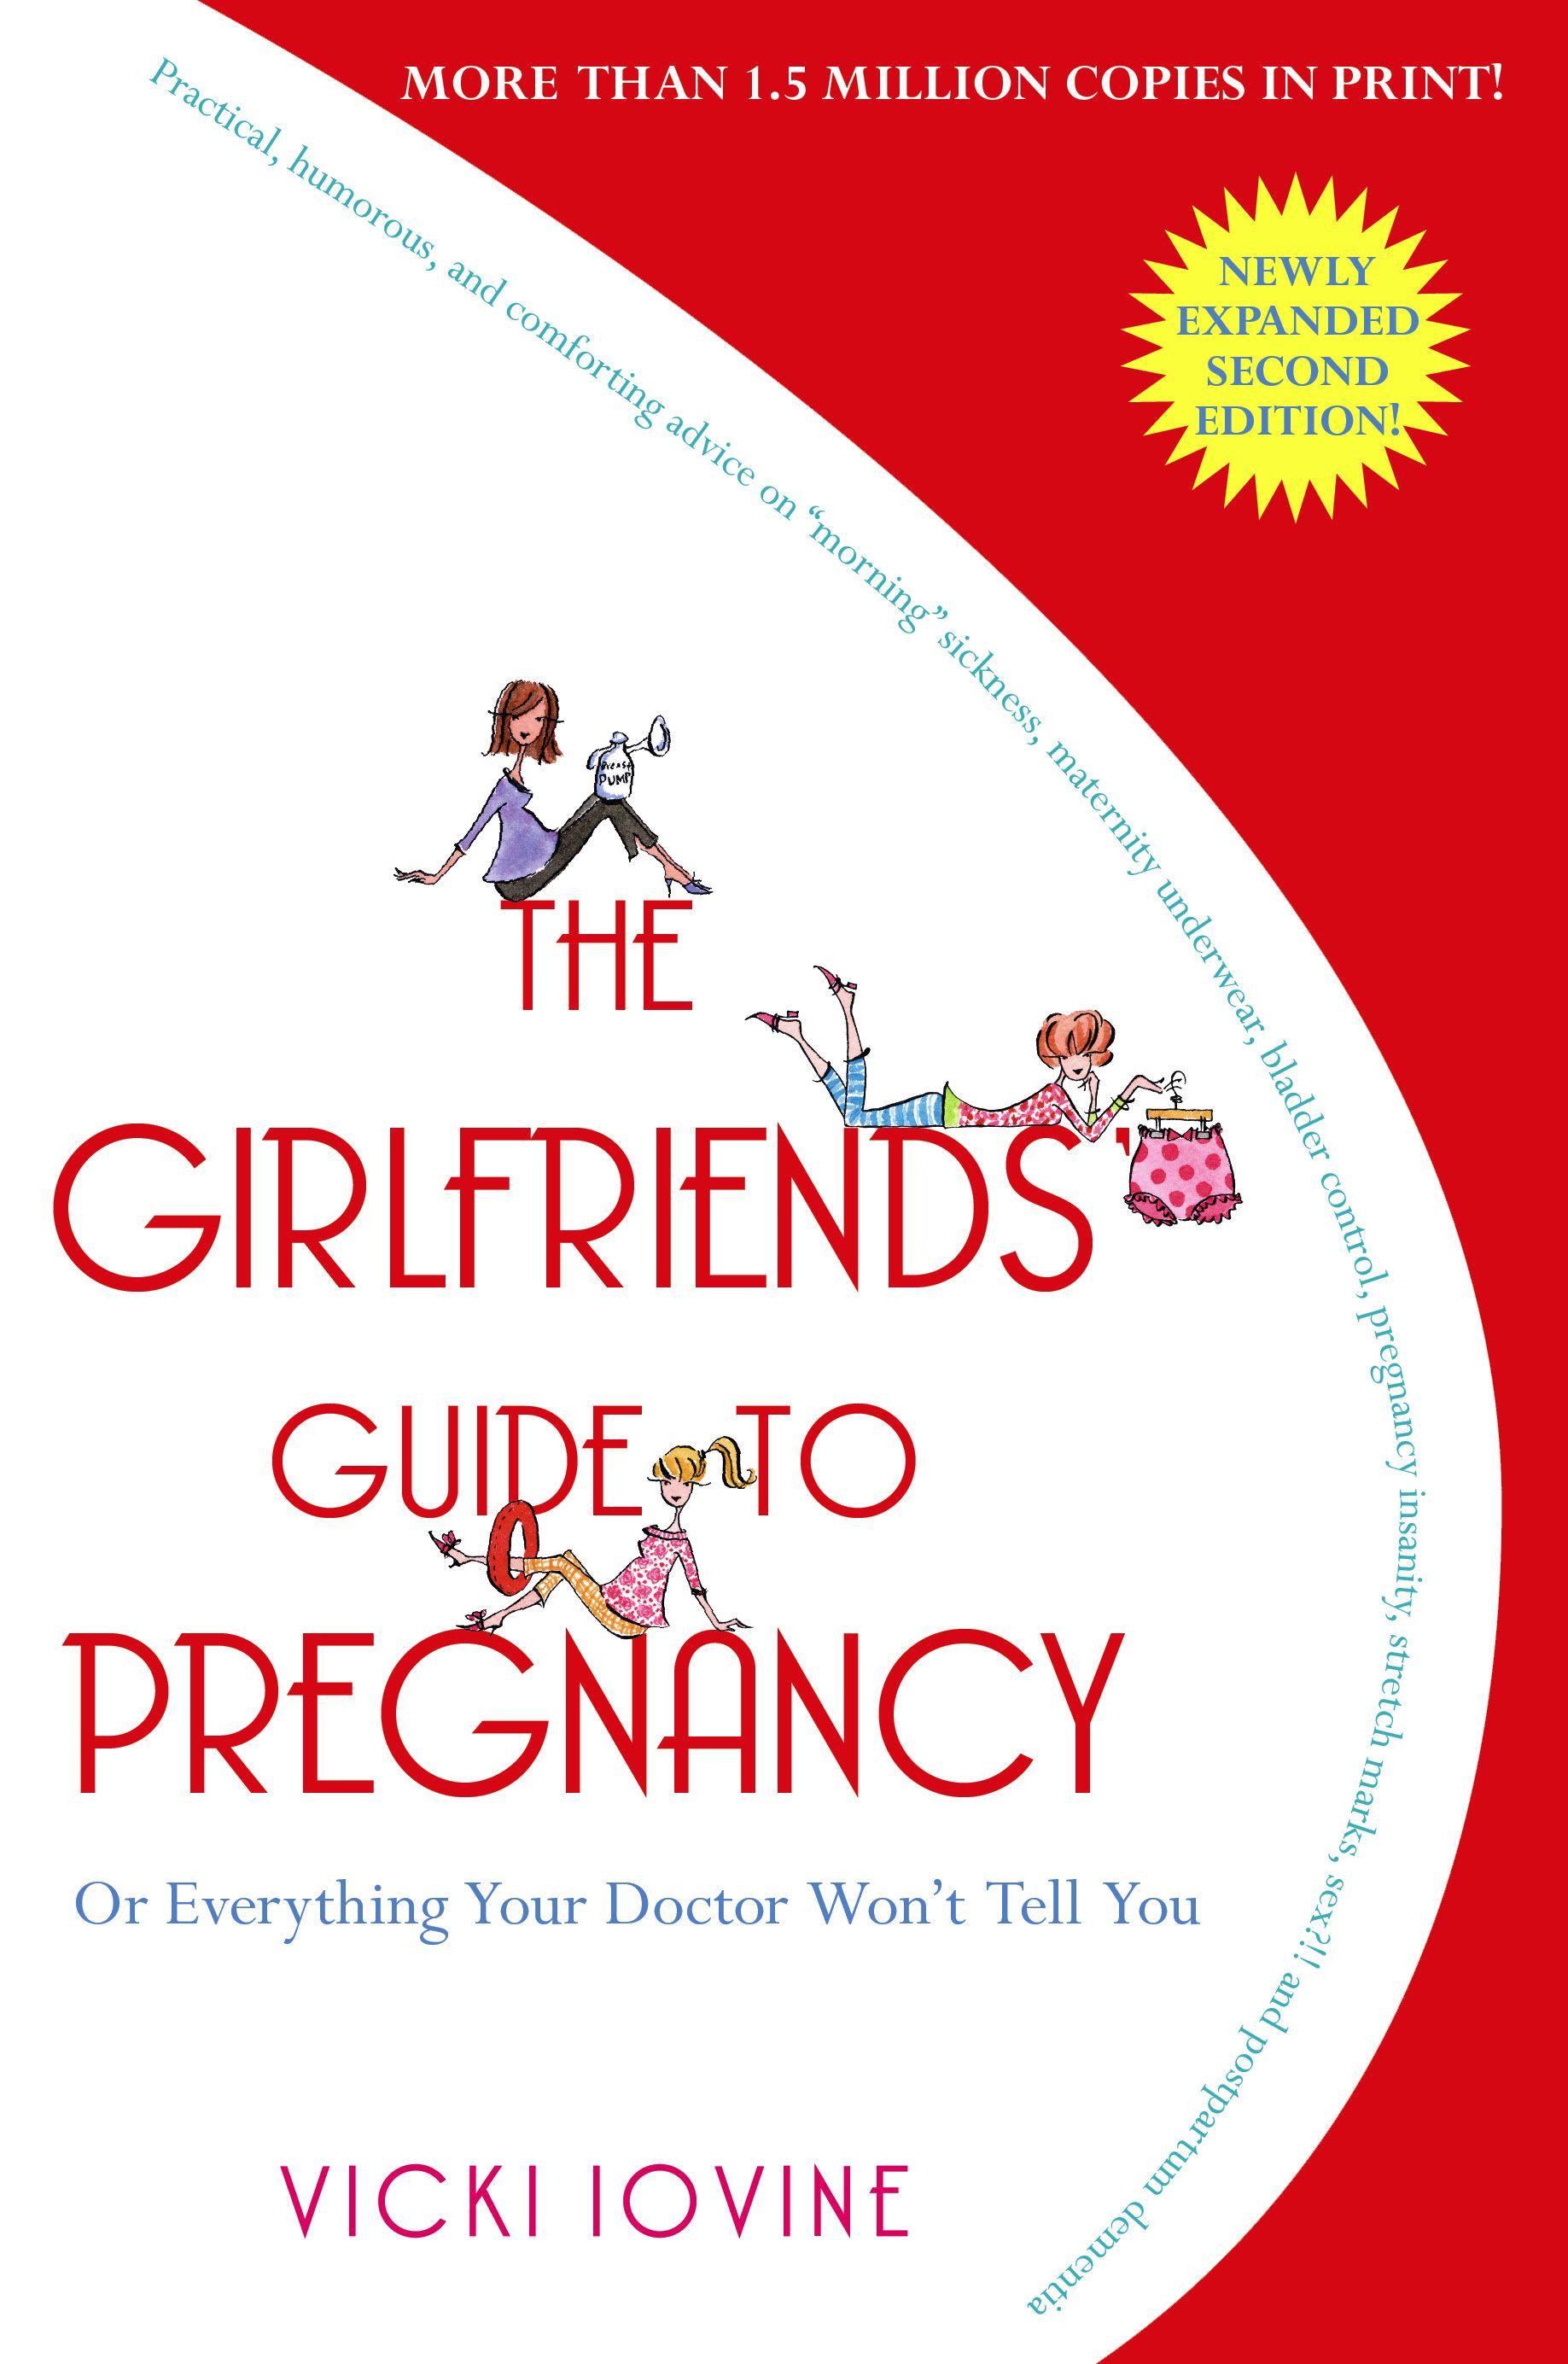 the girlfriends guide to pregnancy book by vicki iovine rh simonandschuster com Girlfriends Guide to Pregnancy Book Pregnancy Textbook